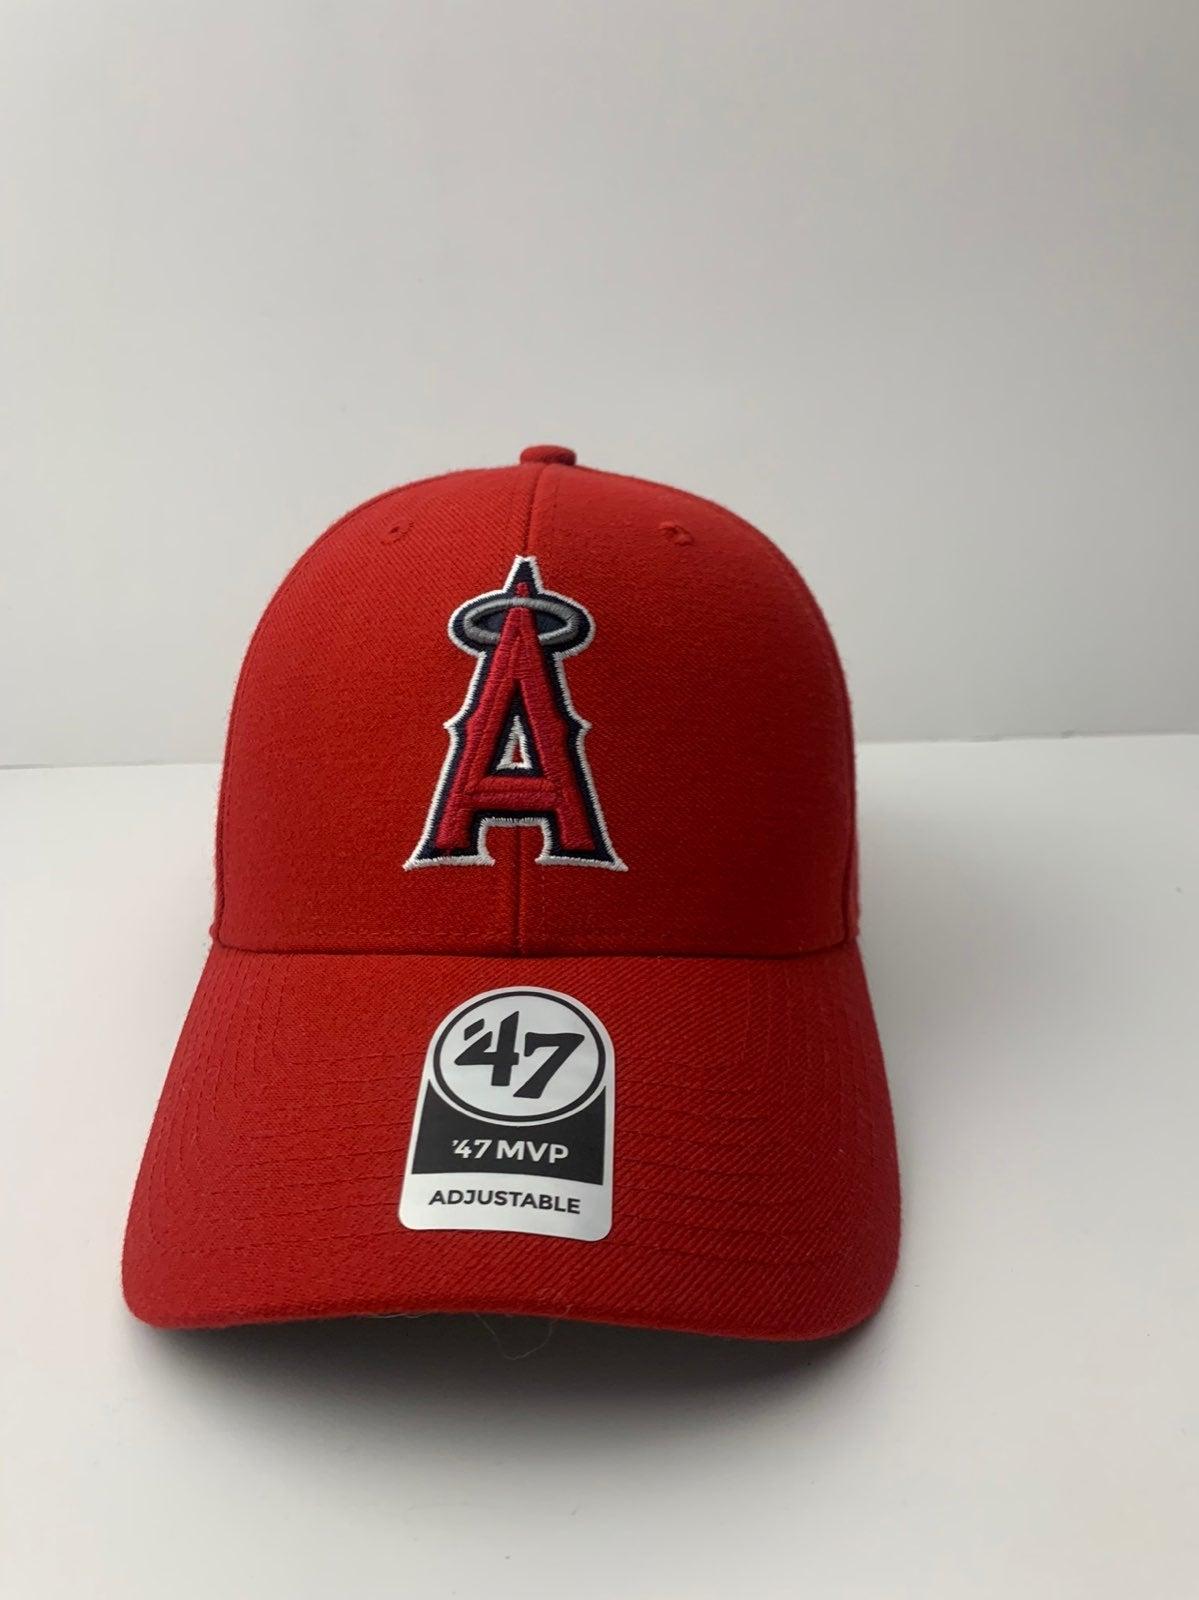 Angles Red BaseBall Hat Adjustable